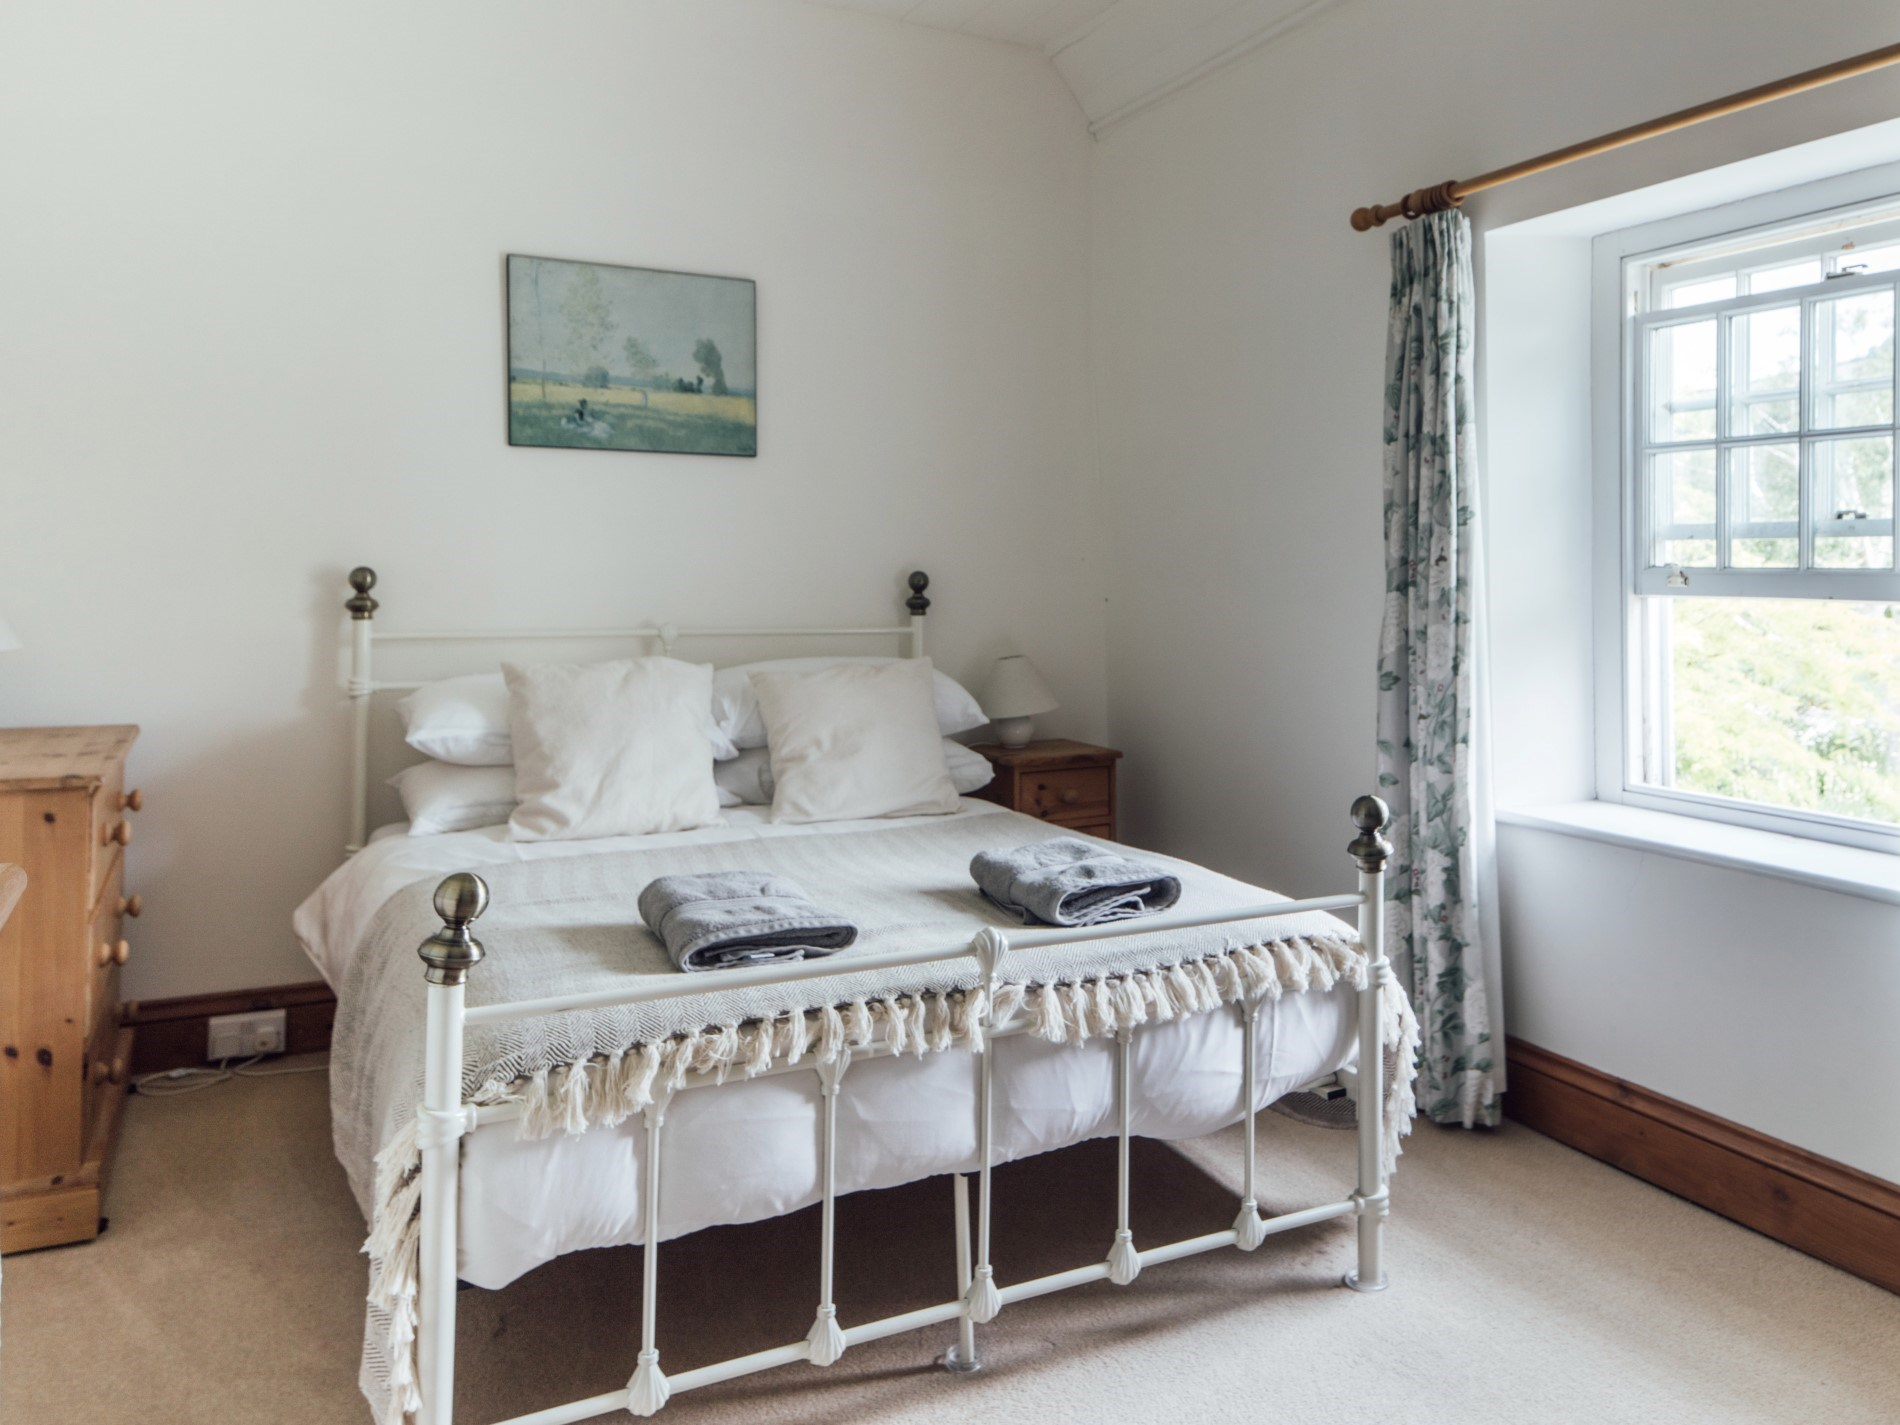 3 Bedroom Cottage in Mid and East Devon, Devon